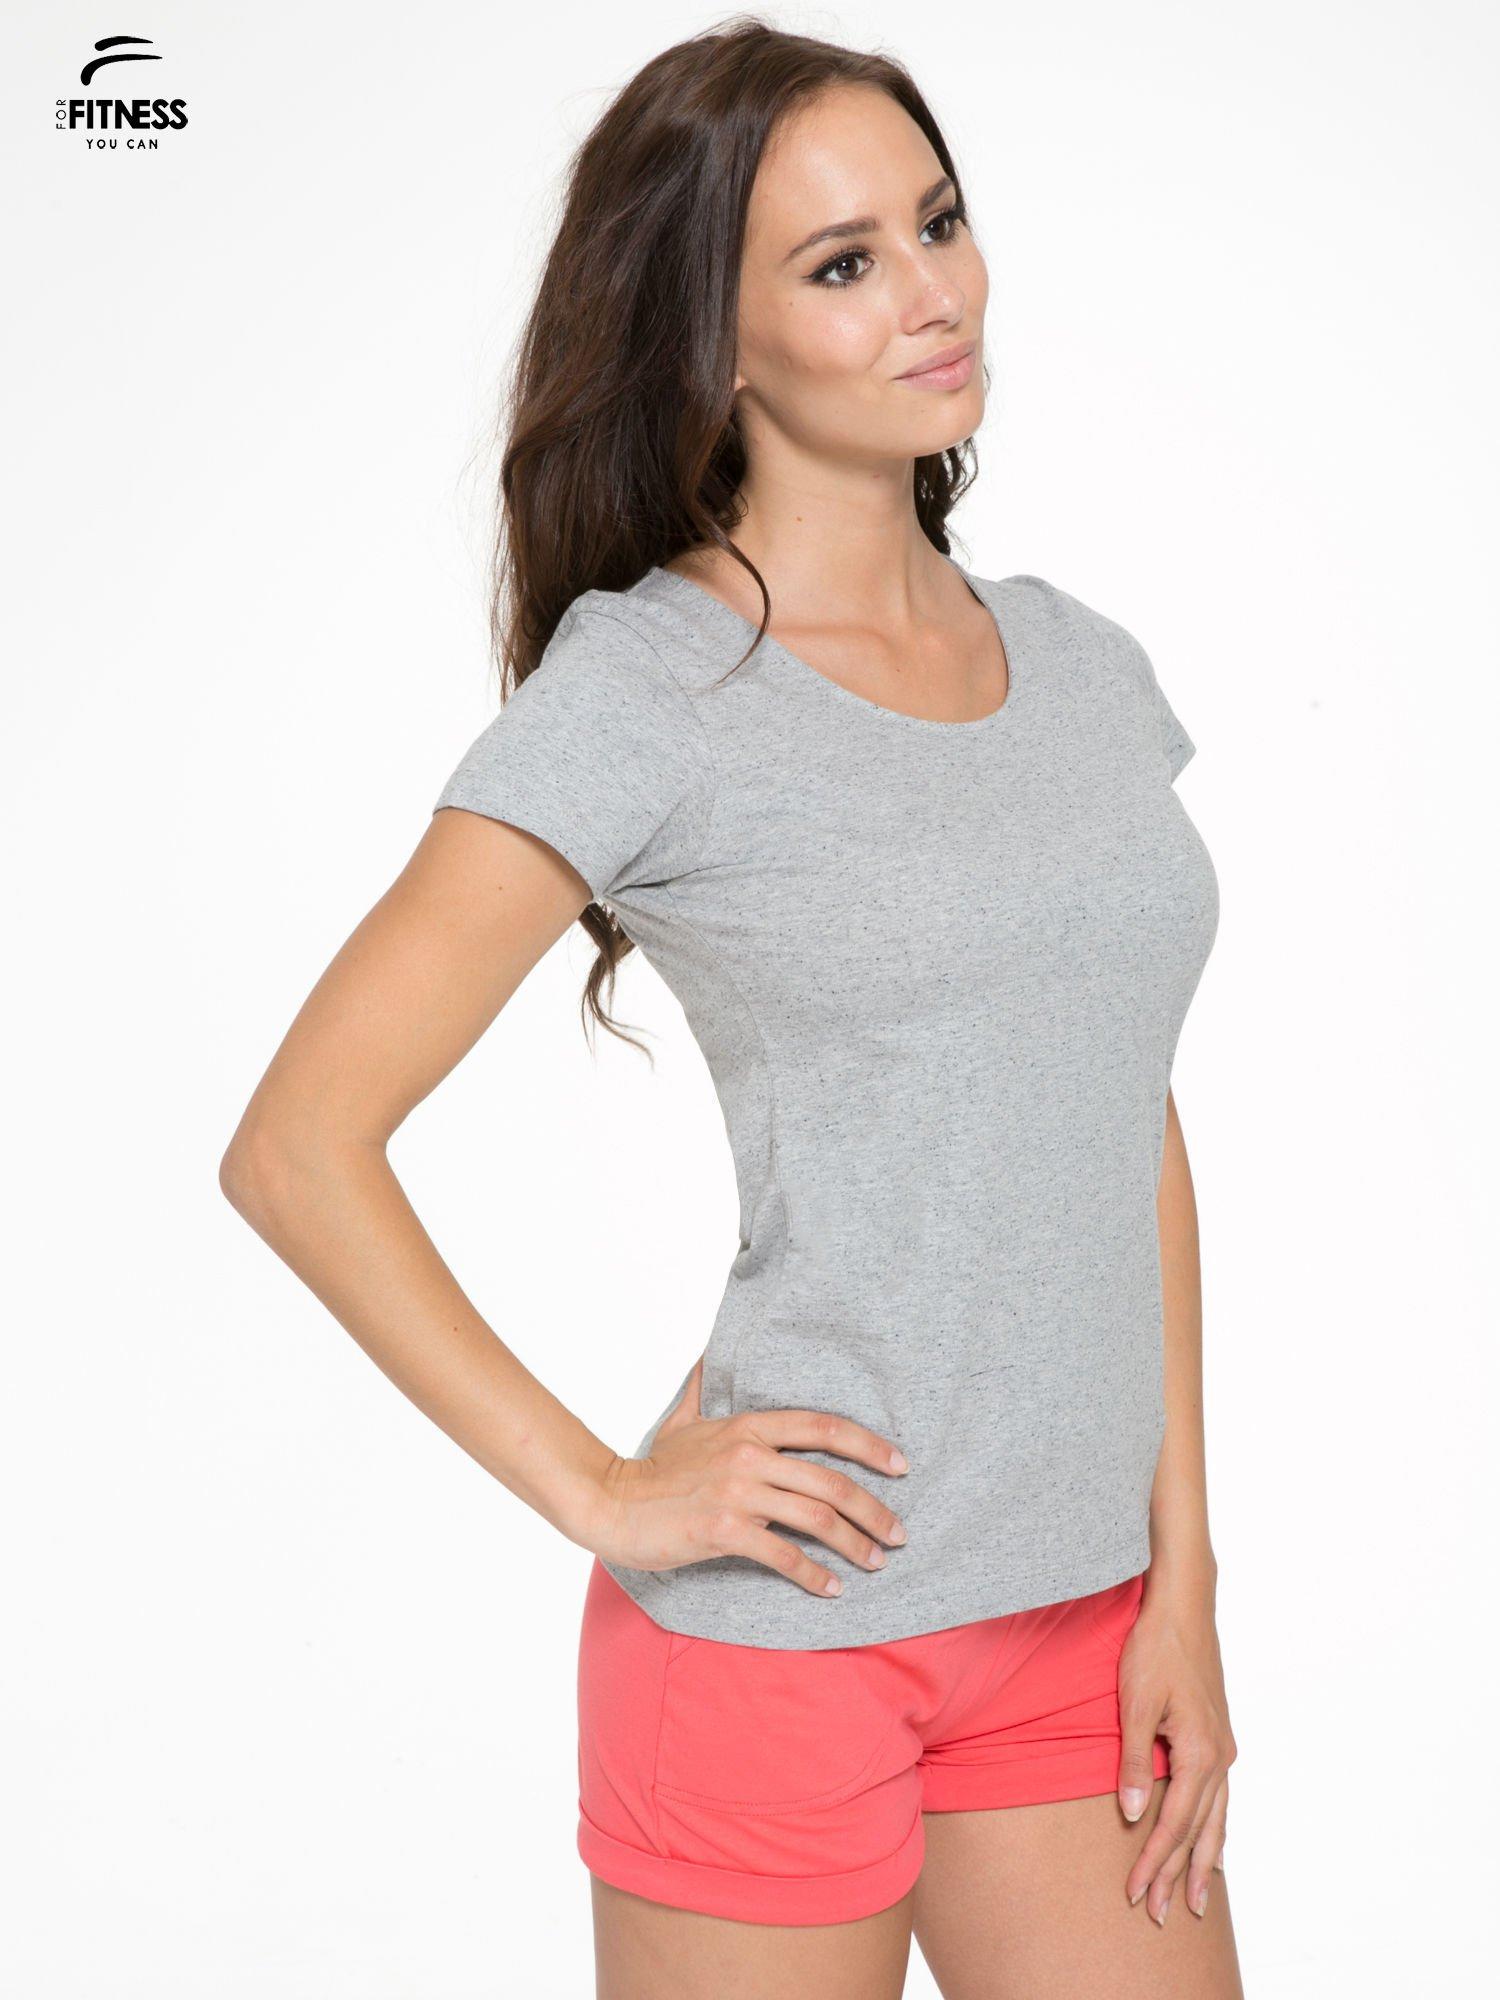 Szary bawełniany t-shirt damski typu basic                                  zdj.                                  3